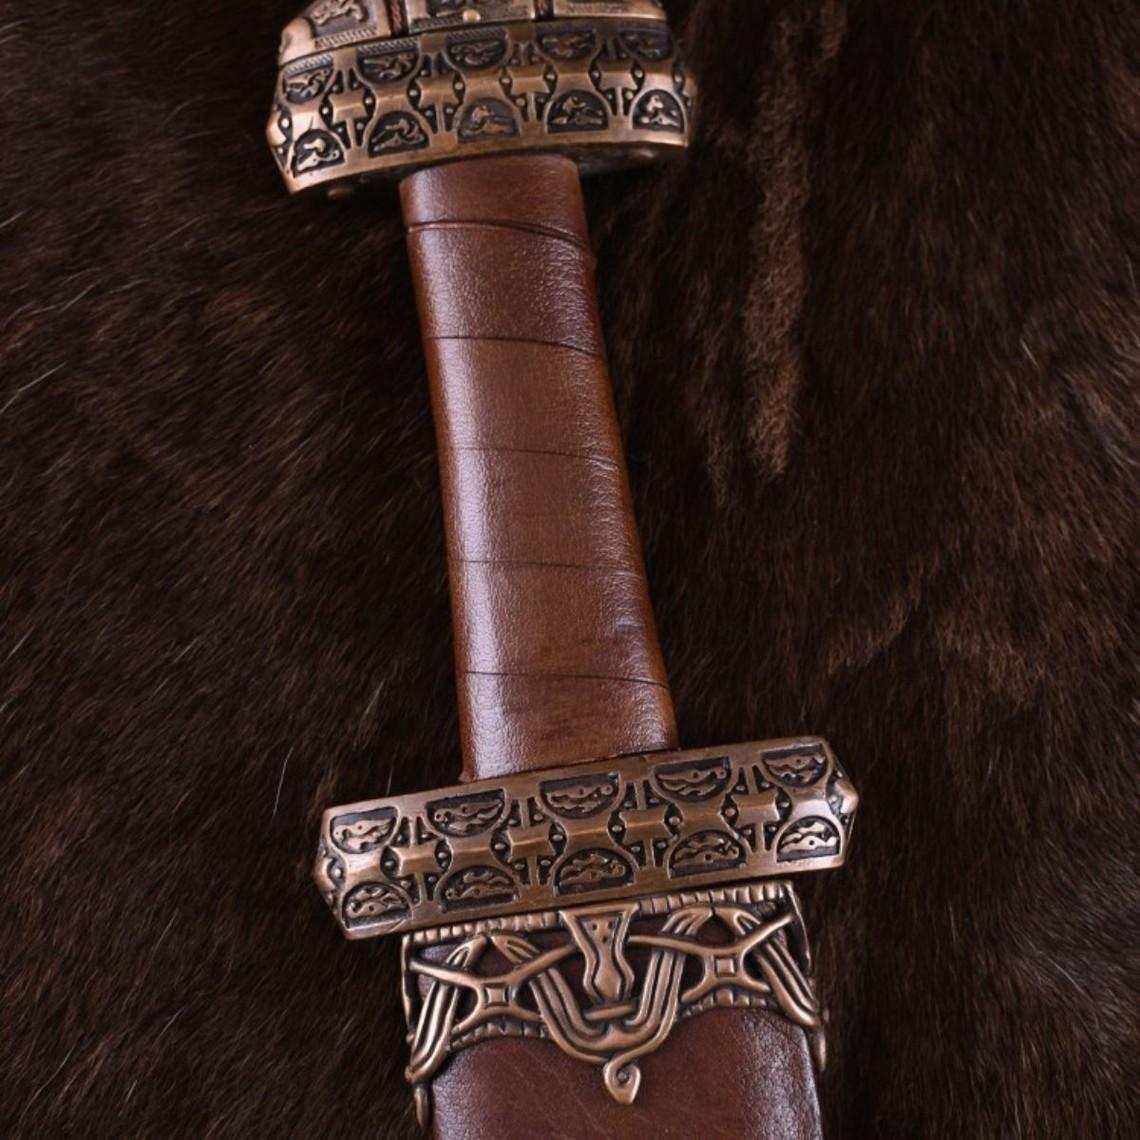 Deepeeka Viking isla Eigg espada, empuñadura de cuero, templado